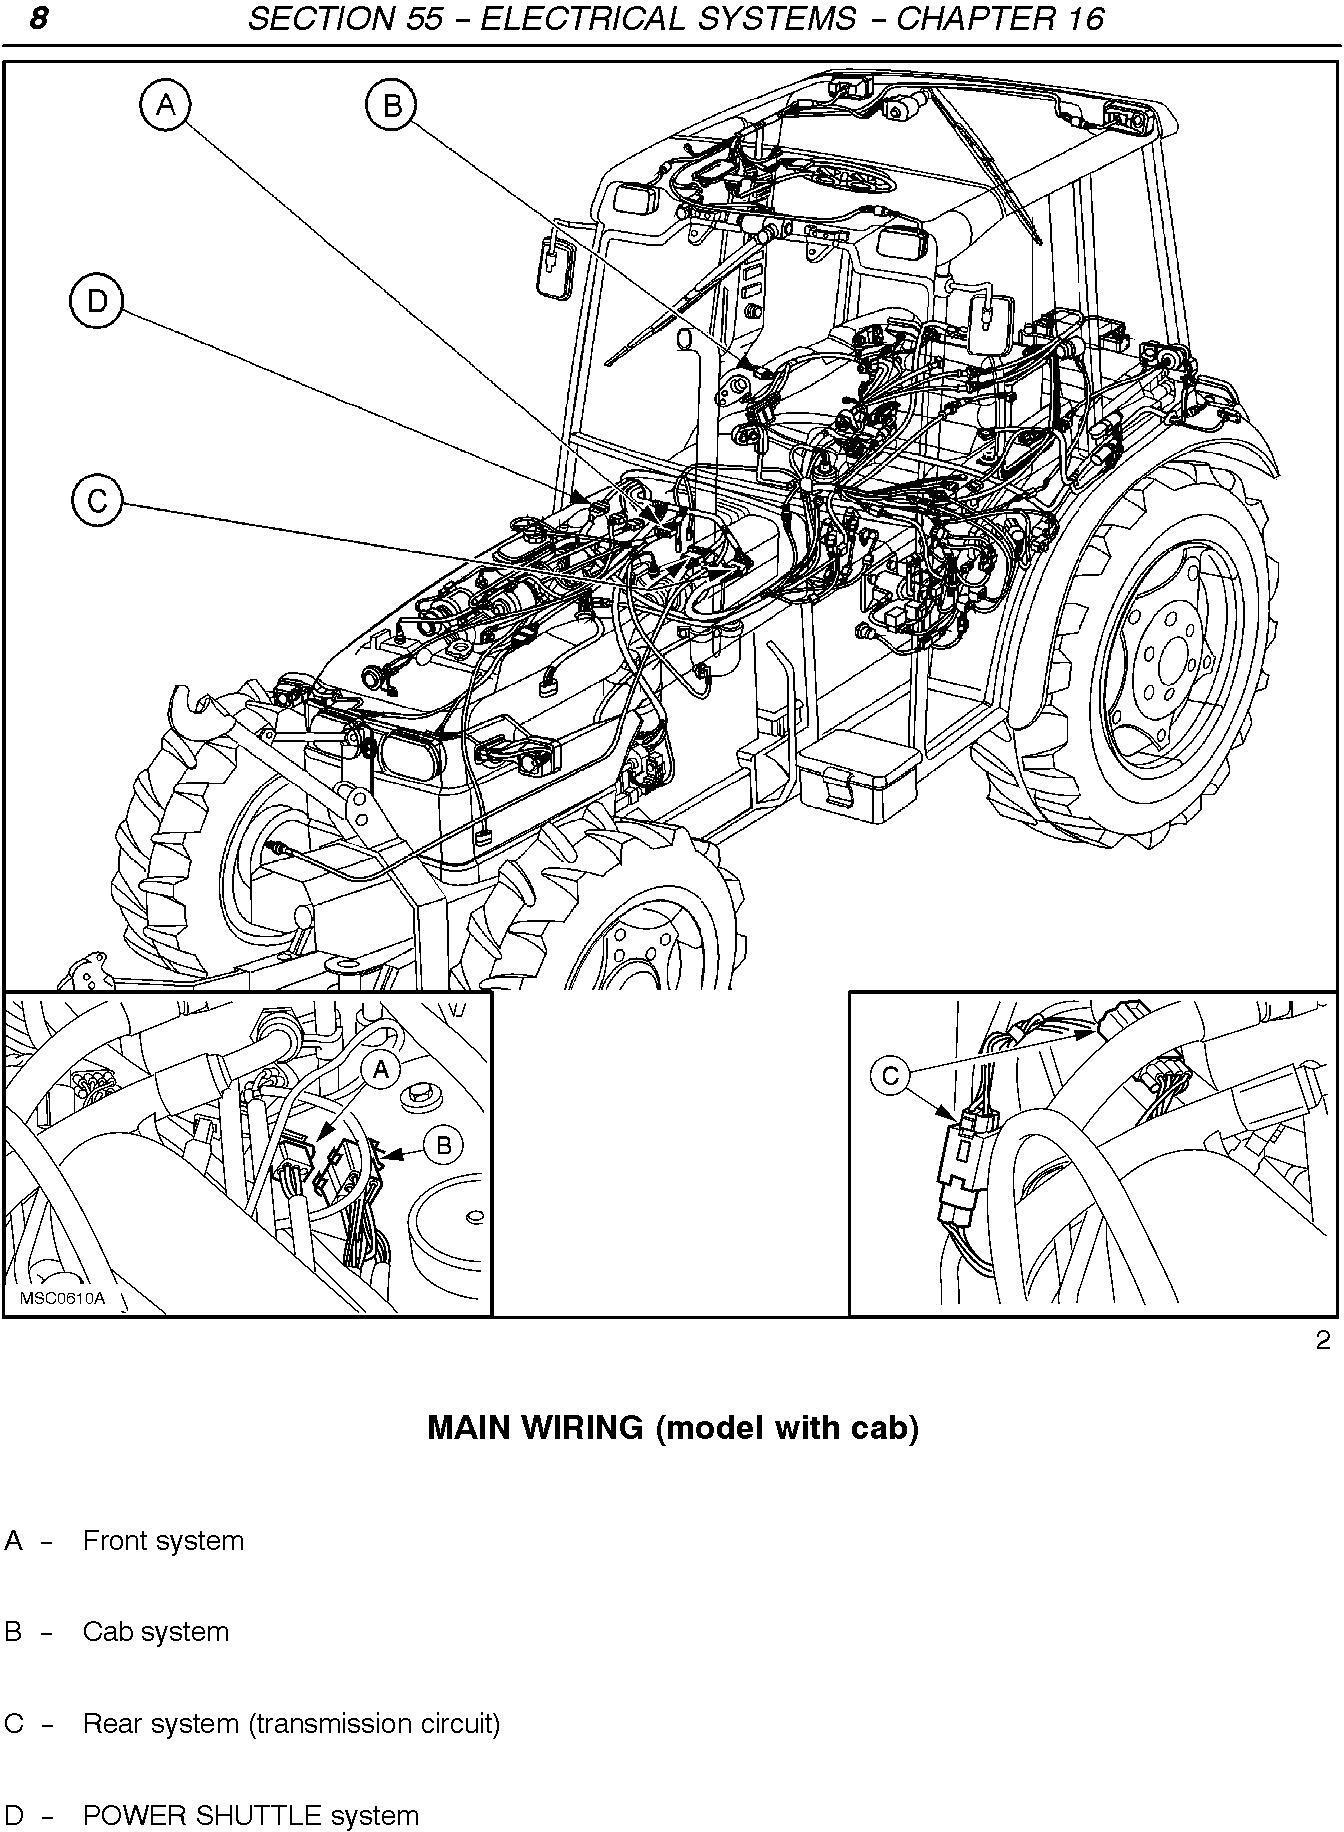 New Holland TN65F, TN70F, TN75F, TN80F, TN90F, TN95F Tractor Service Manual - 3